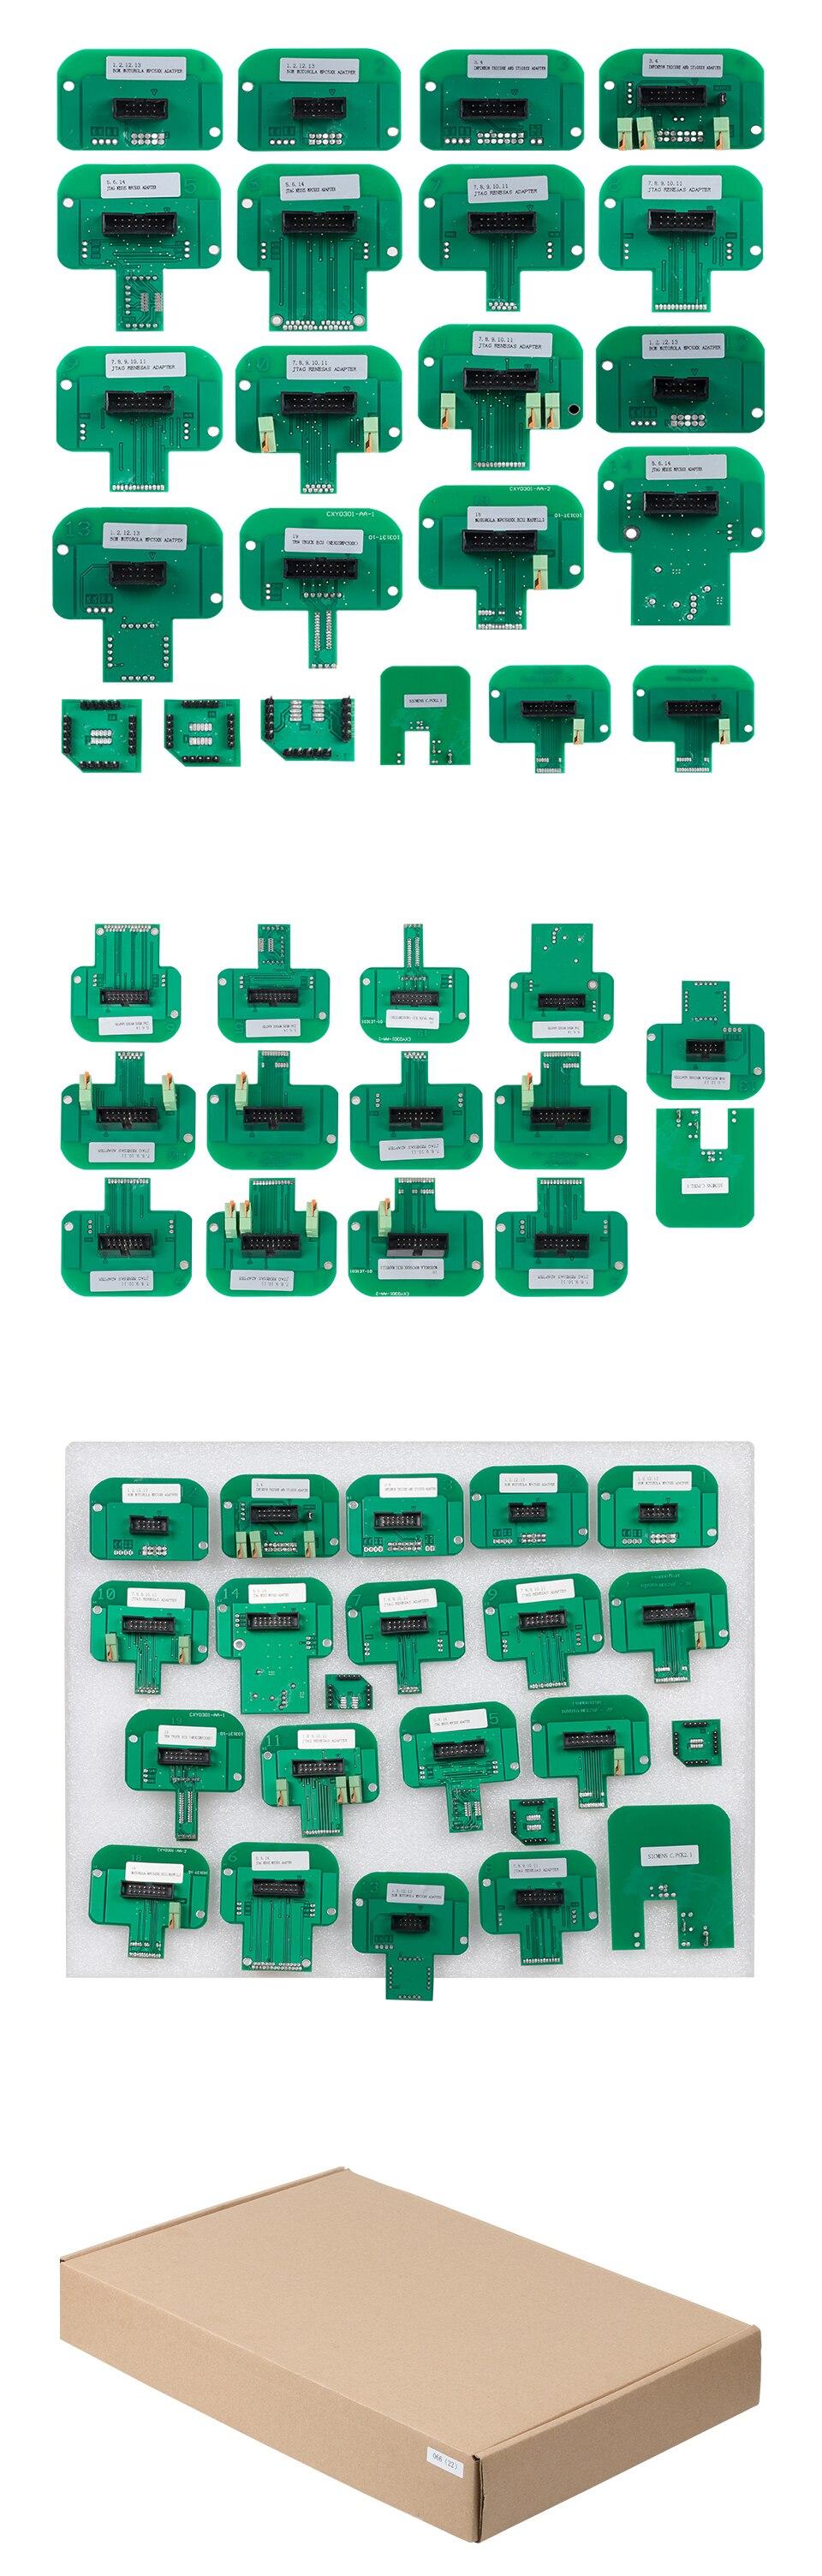 HTB1L6vcVIfpK1RjSZFOq6y6nFXay KESS V2 V5.017 full Online V2.47 Manager Tuning Kit KTAG V7.020 4 LED Master K-tag V2.25 KESS BDM Titanium Winols ECU programmer